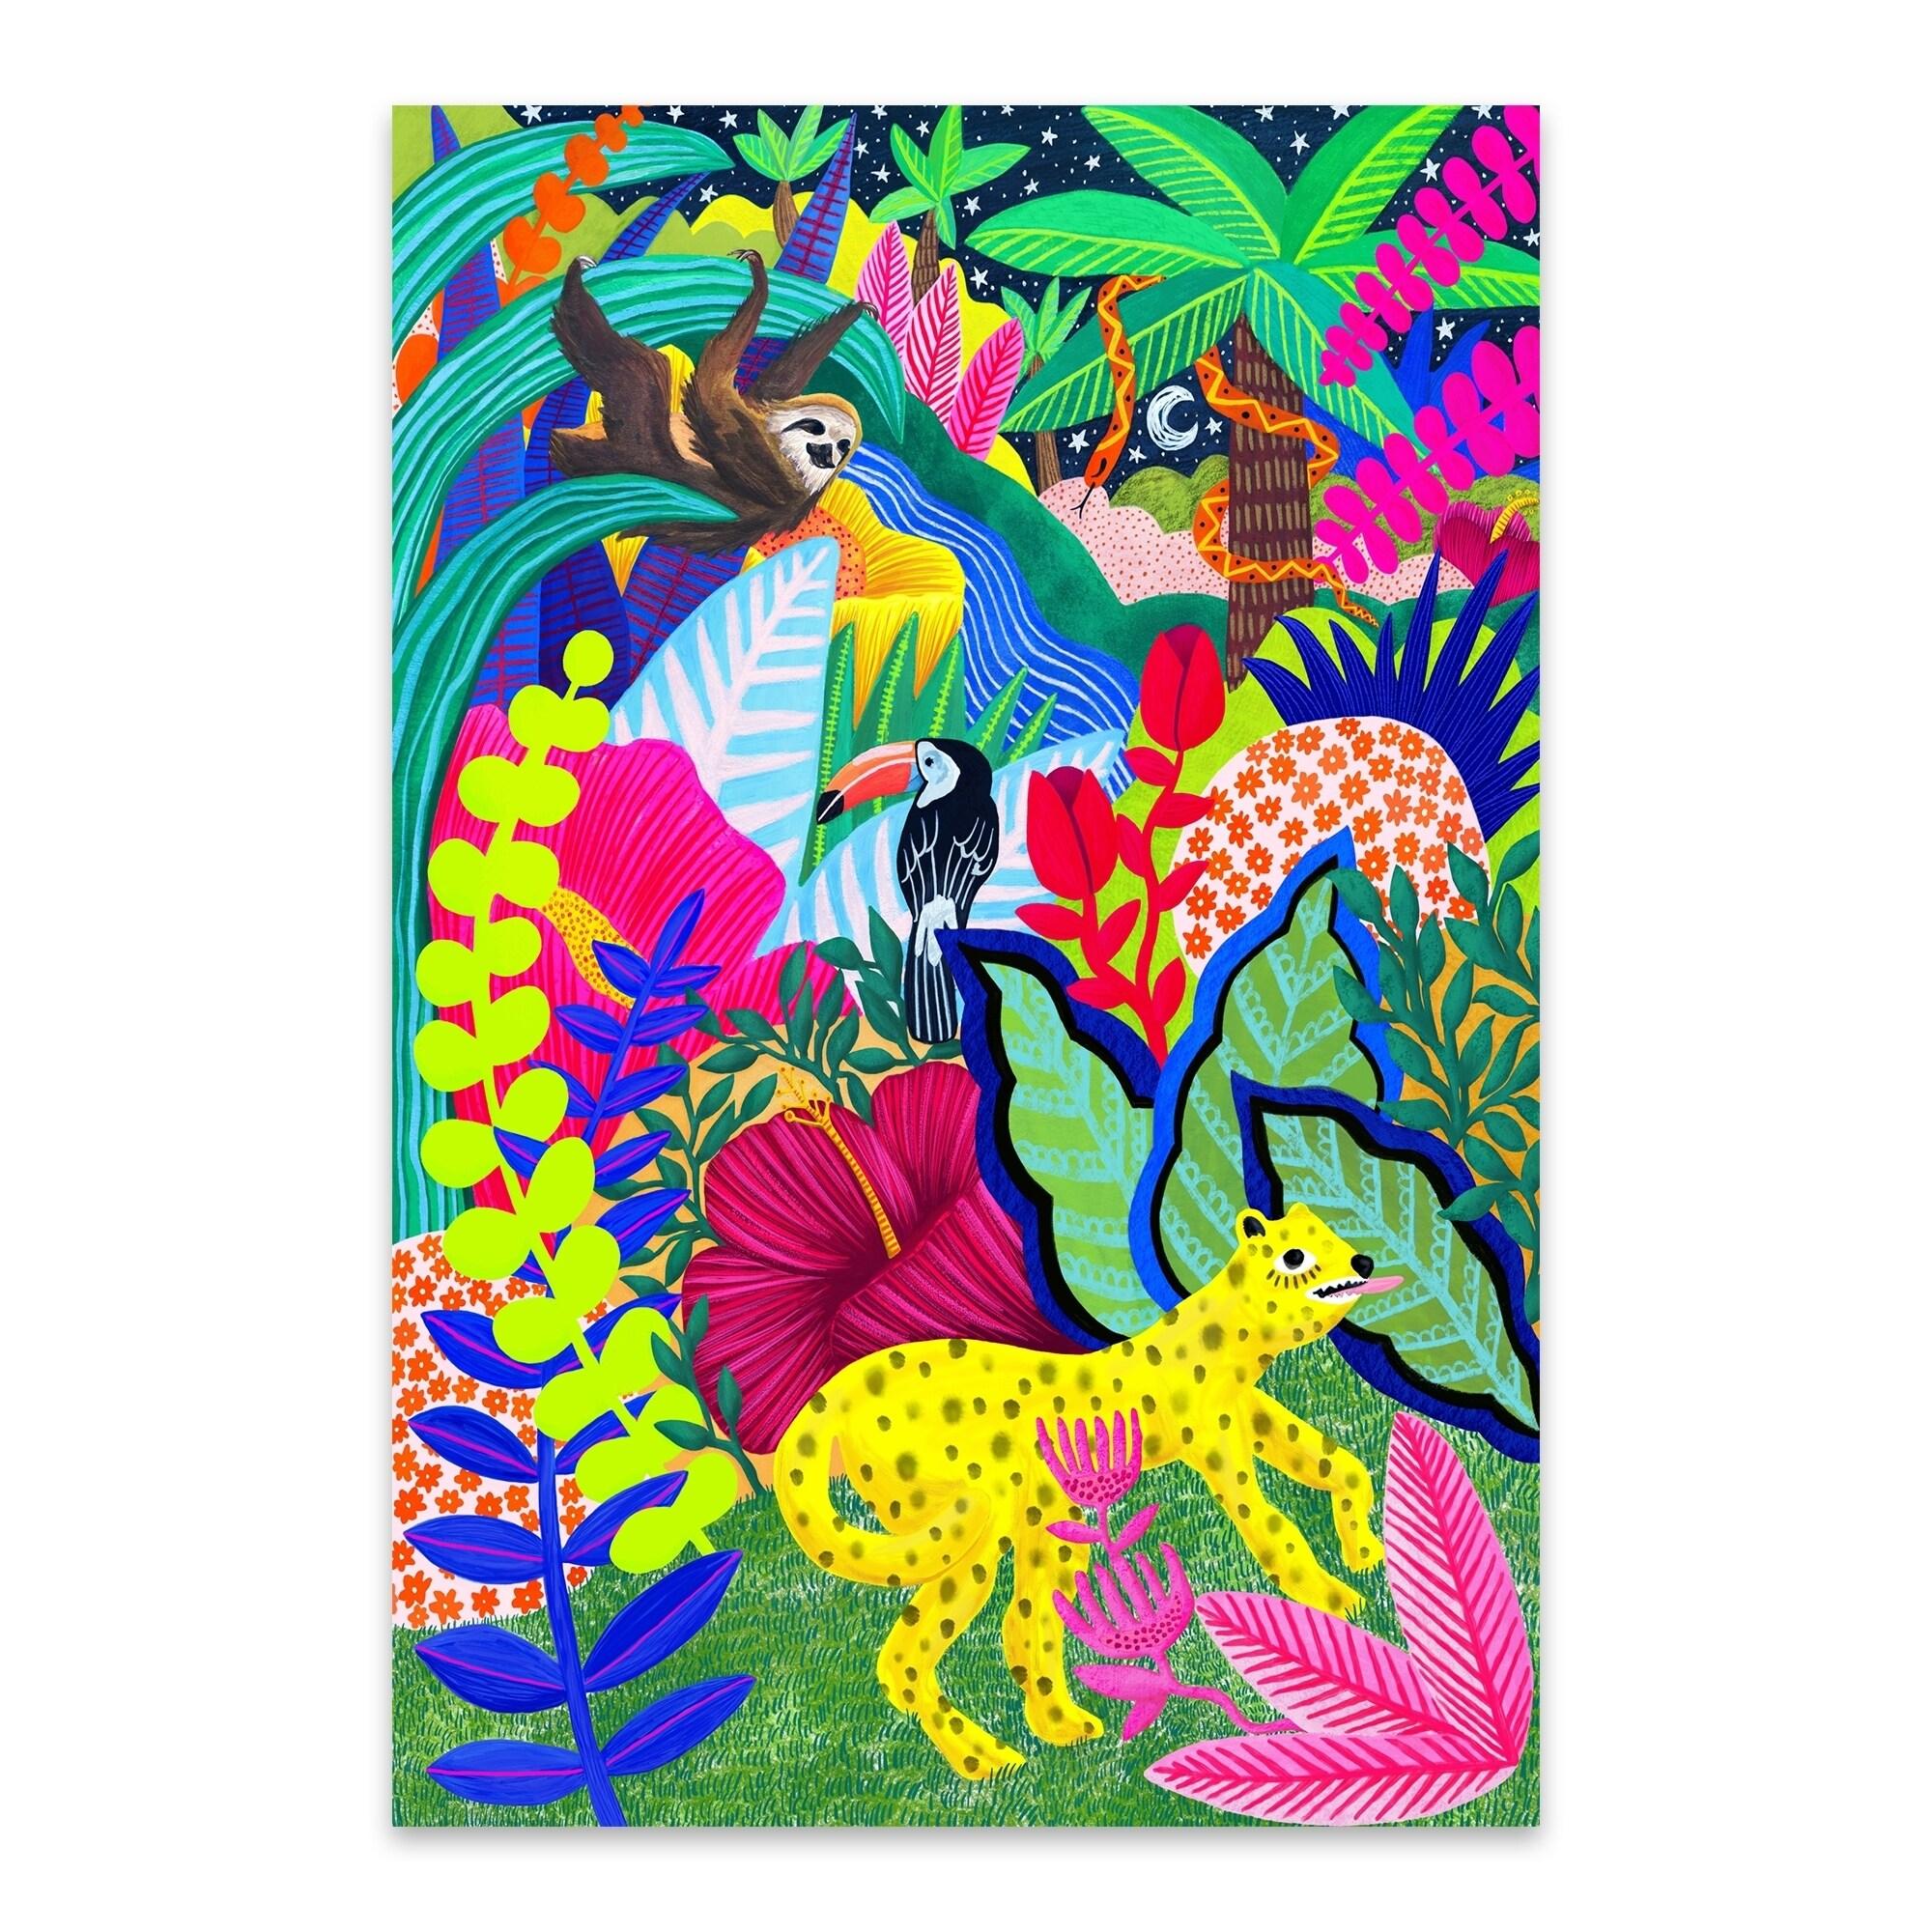 Noir Gallery Jungle Animals Floral Botanical Metal Wall